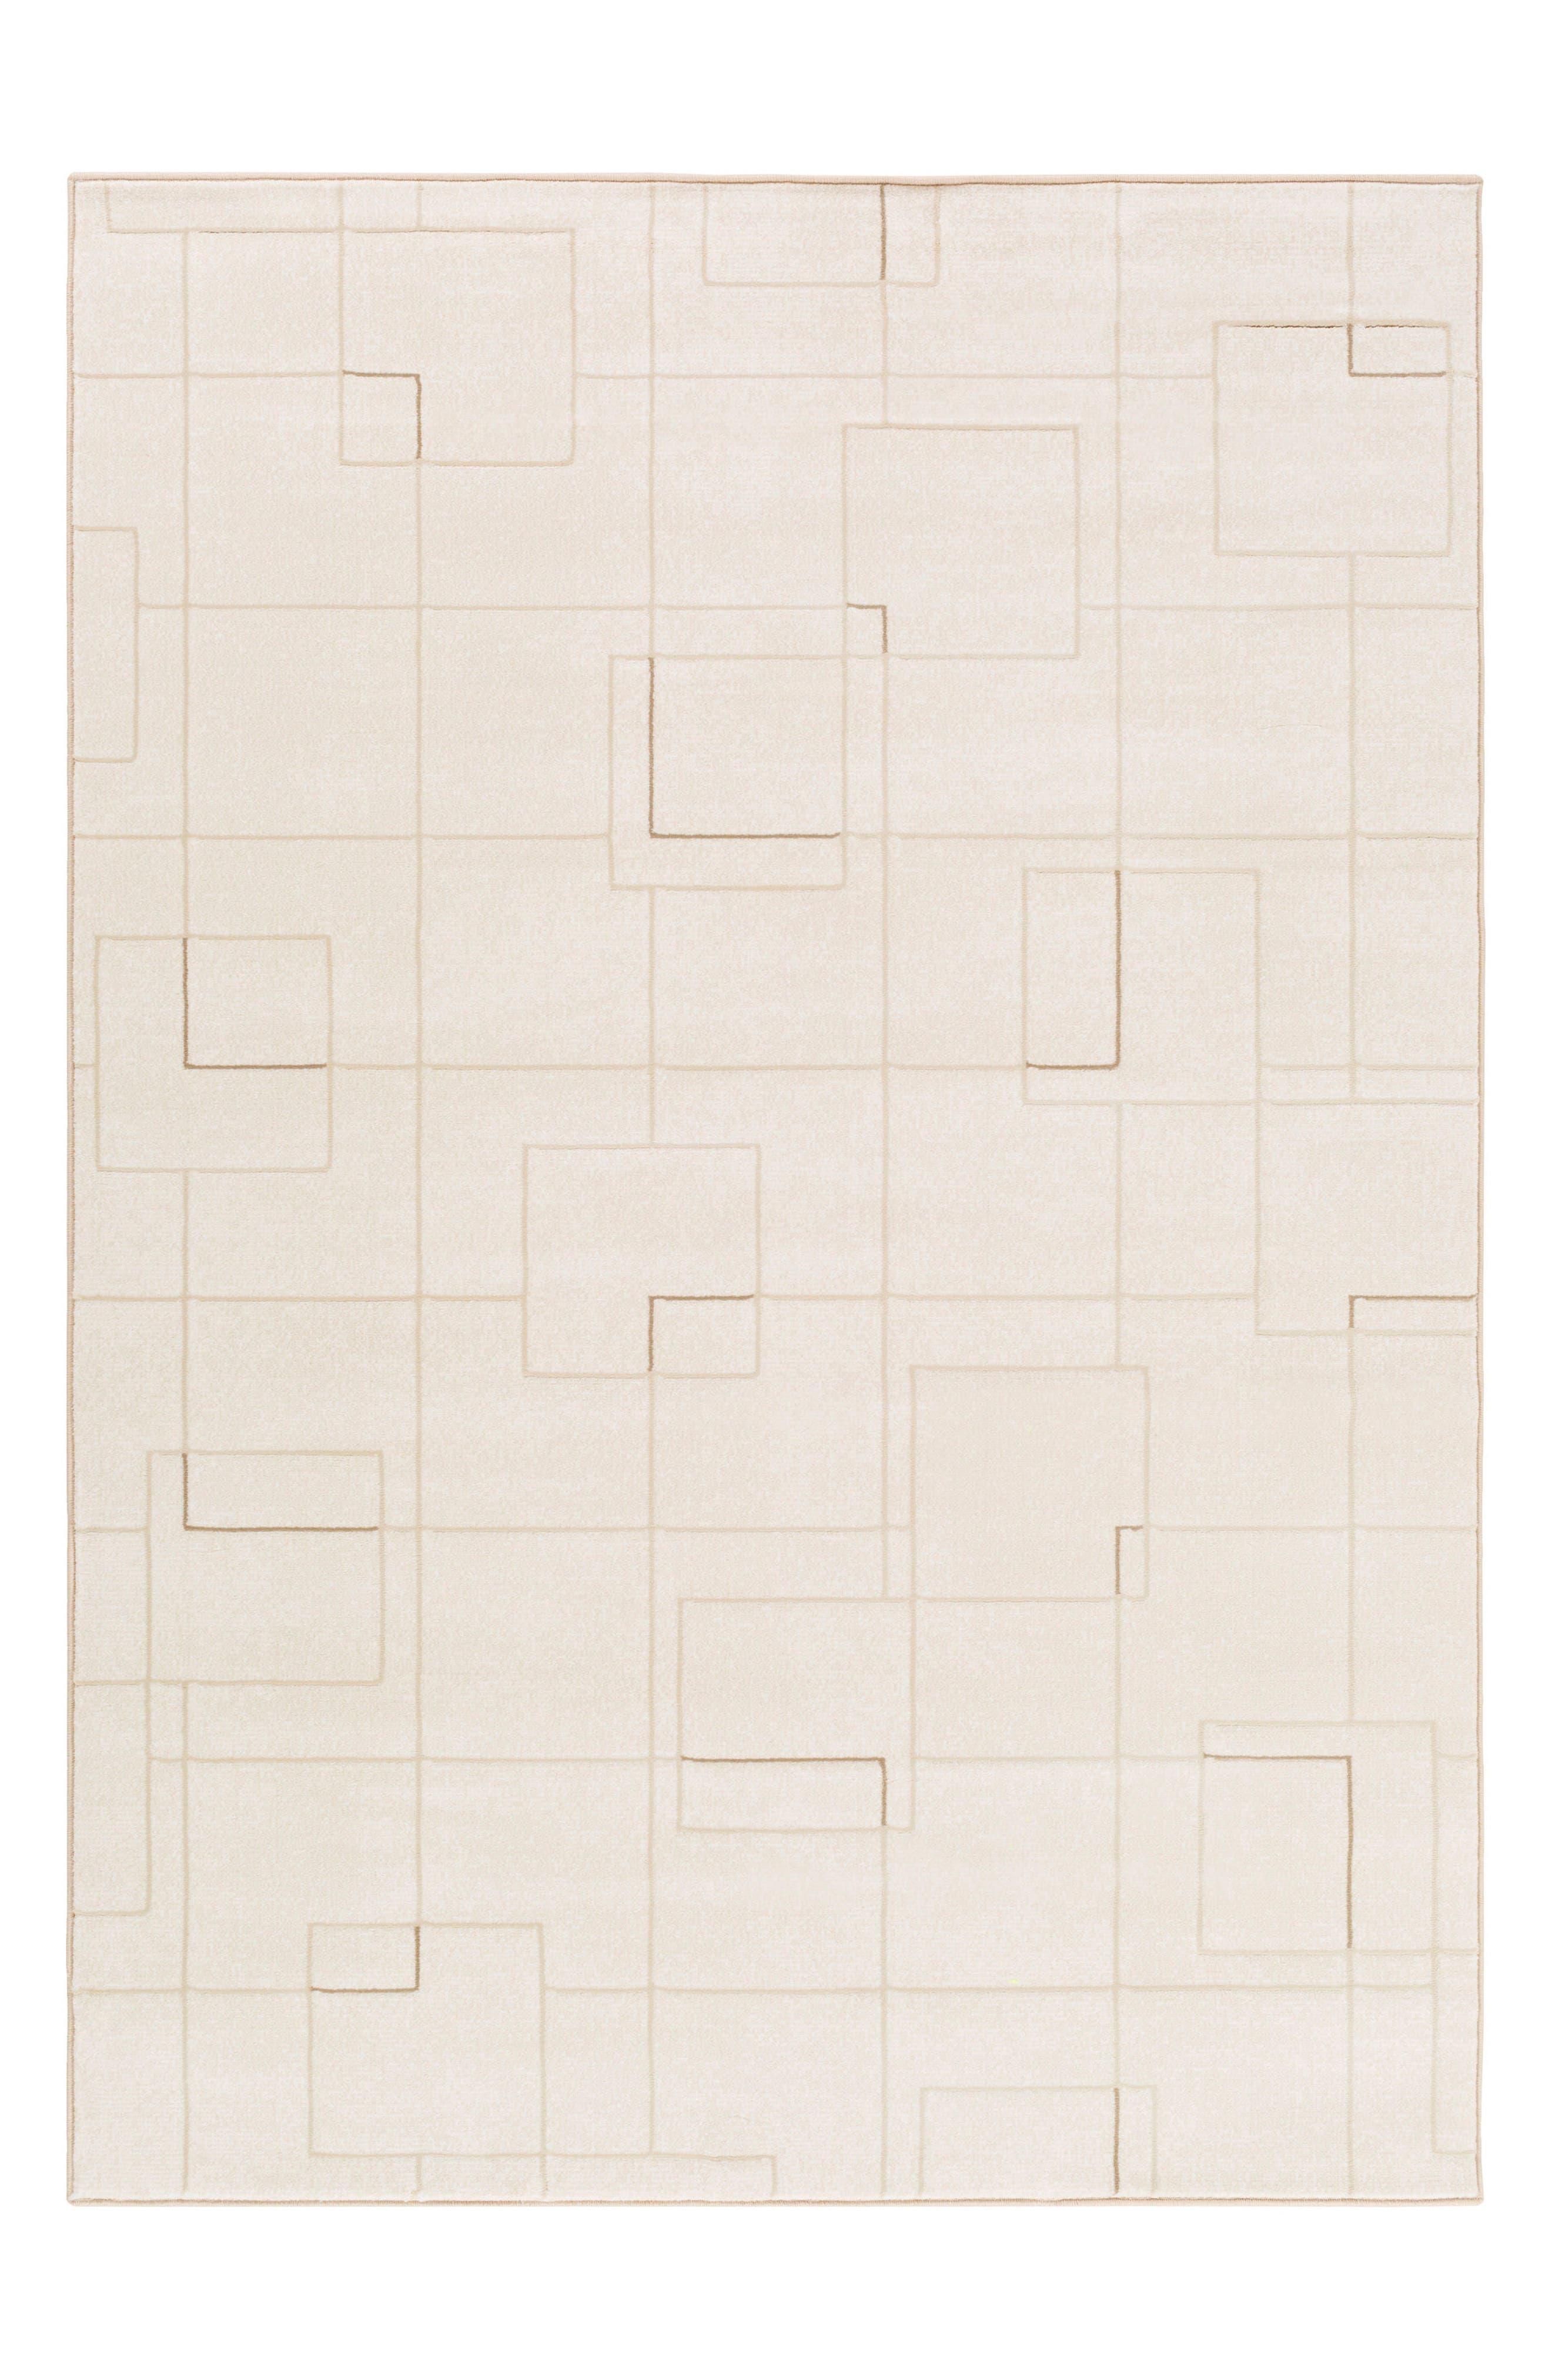 Alternate Image 1 Selected - Surya Home Modern Grid Rug